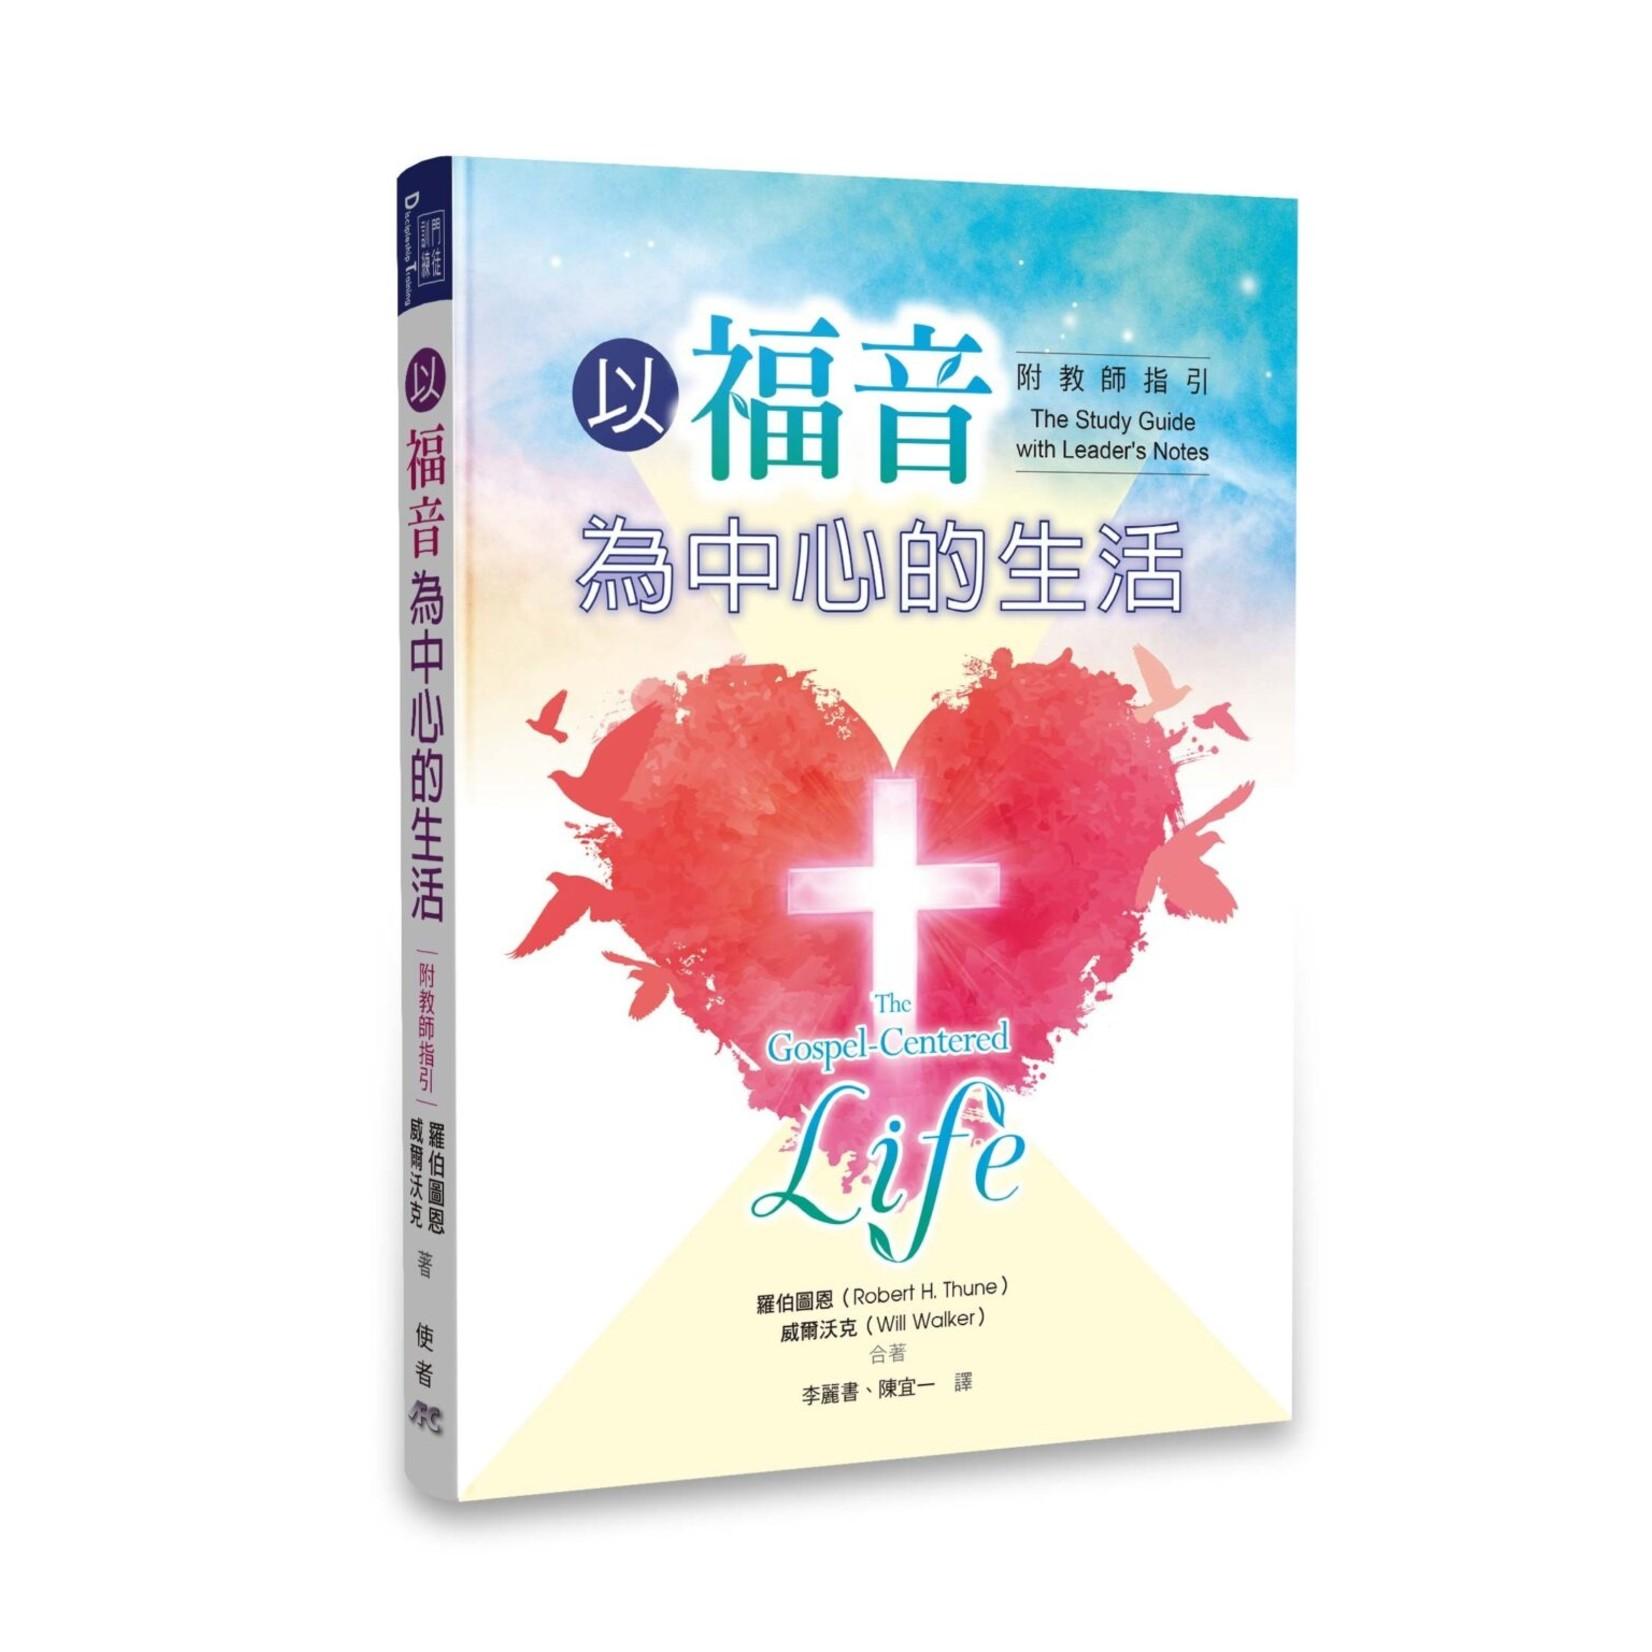 基督使者協會 Ambassadors for Christ 以福音為中心的生活(教師本) The Gospel-Centered Life